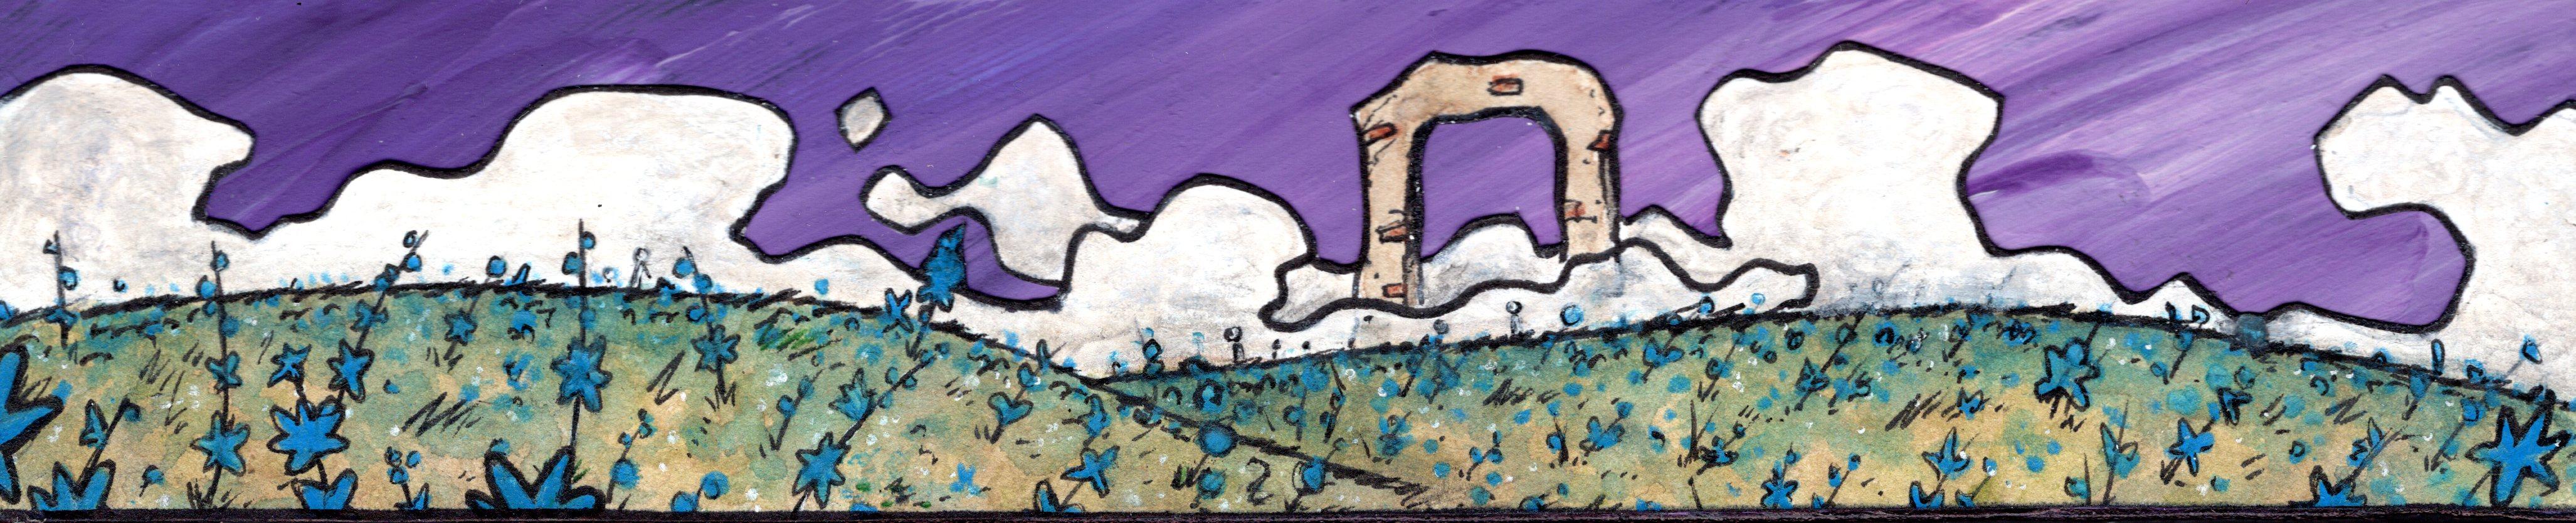 The Asphodel Meadows.